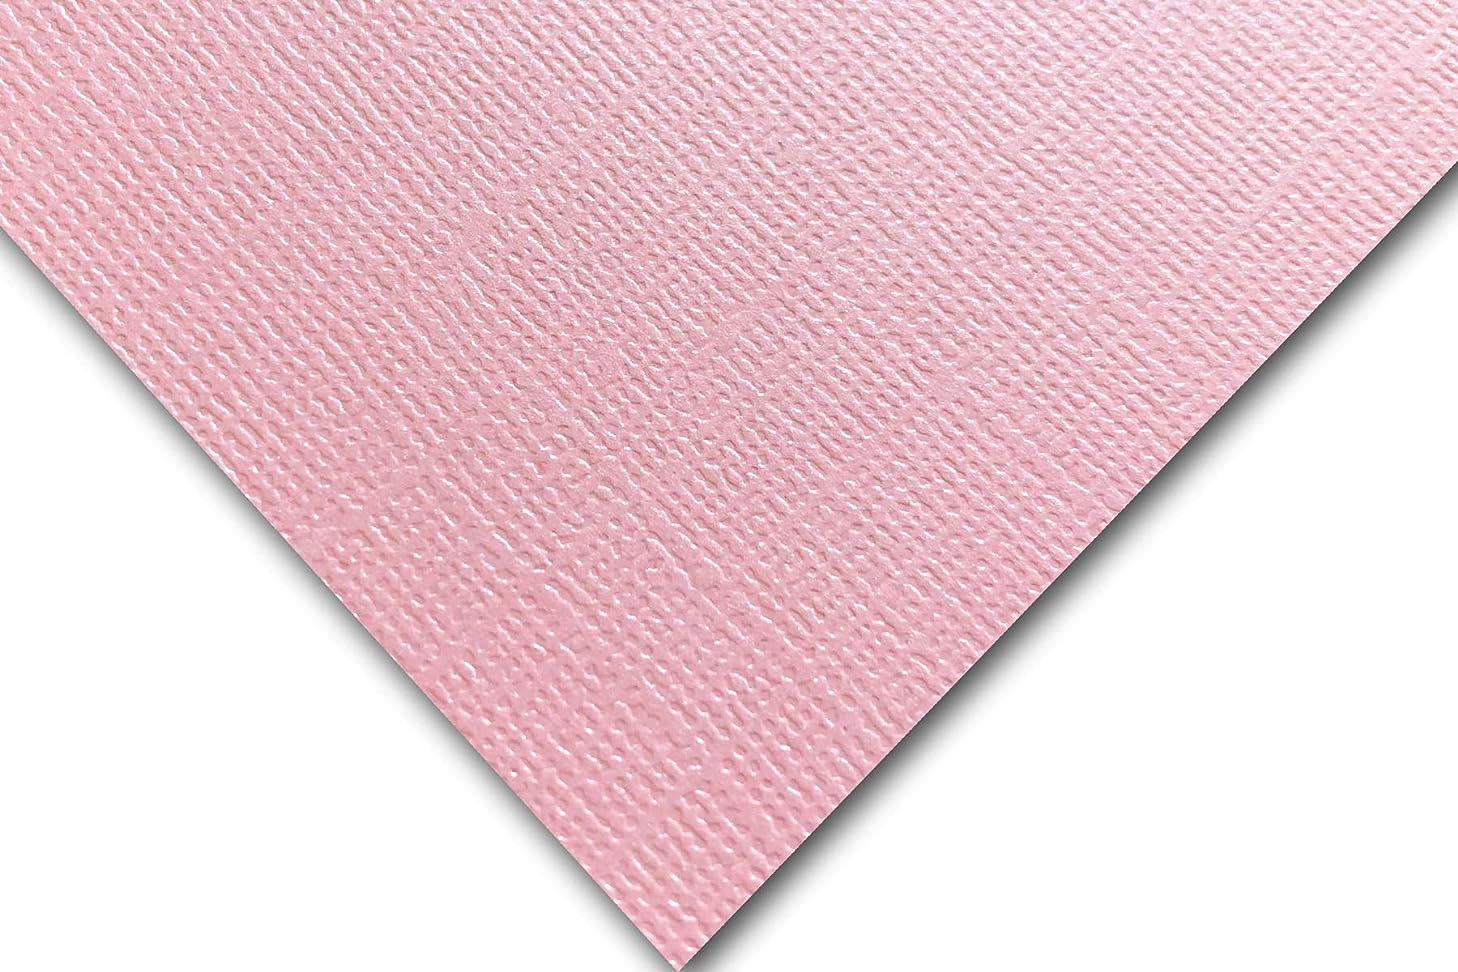 Premium Pearlized Metallic Textured Pink Taffeta Card Stock 20 Sheets - Matches Martha Stewart Pink Taffetta - Great for Scrapbooking, Crafts, Flat Cards, DIY Projects, Etc. (12 x 12)